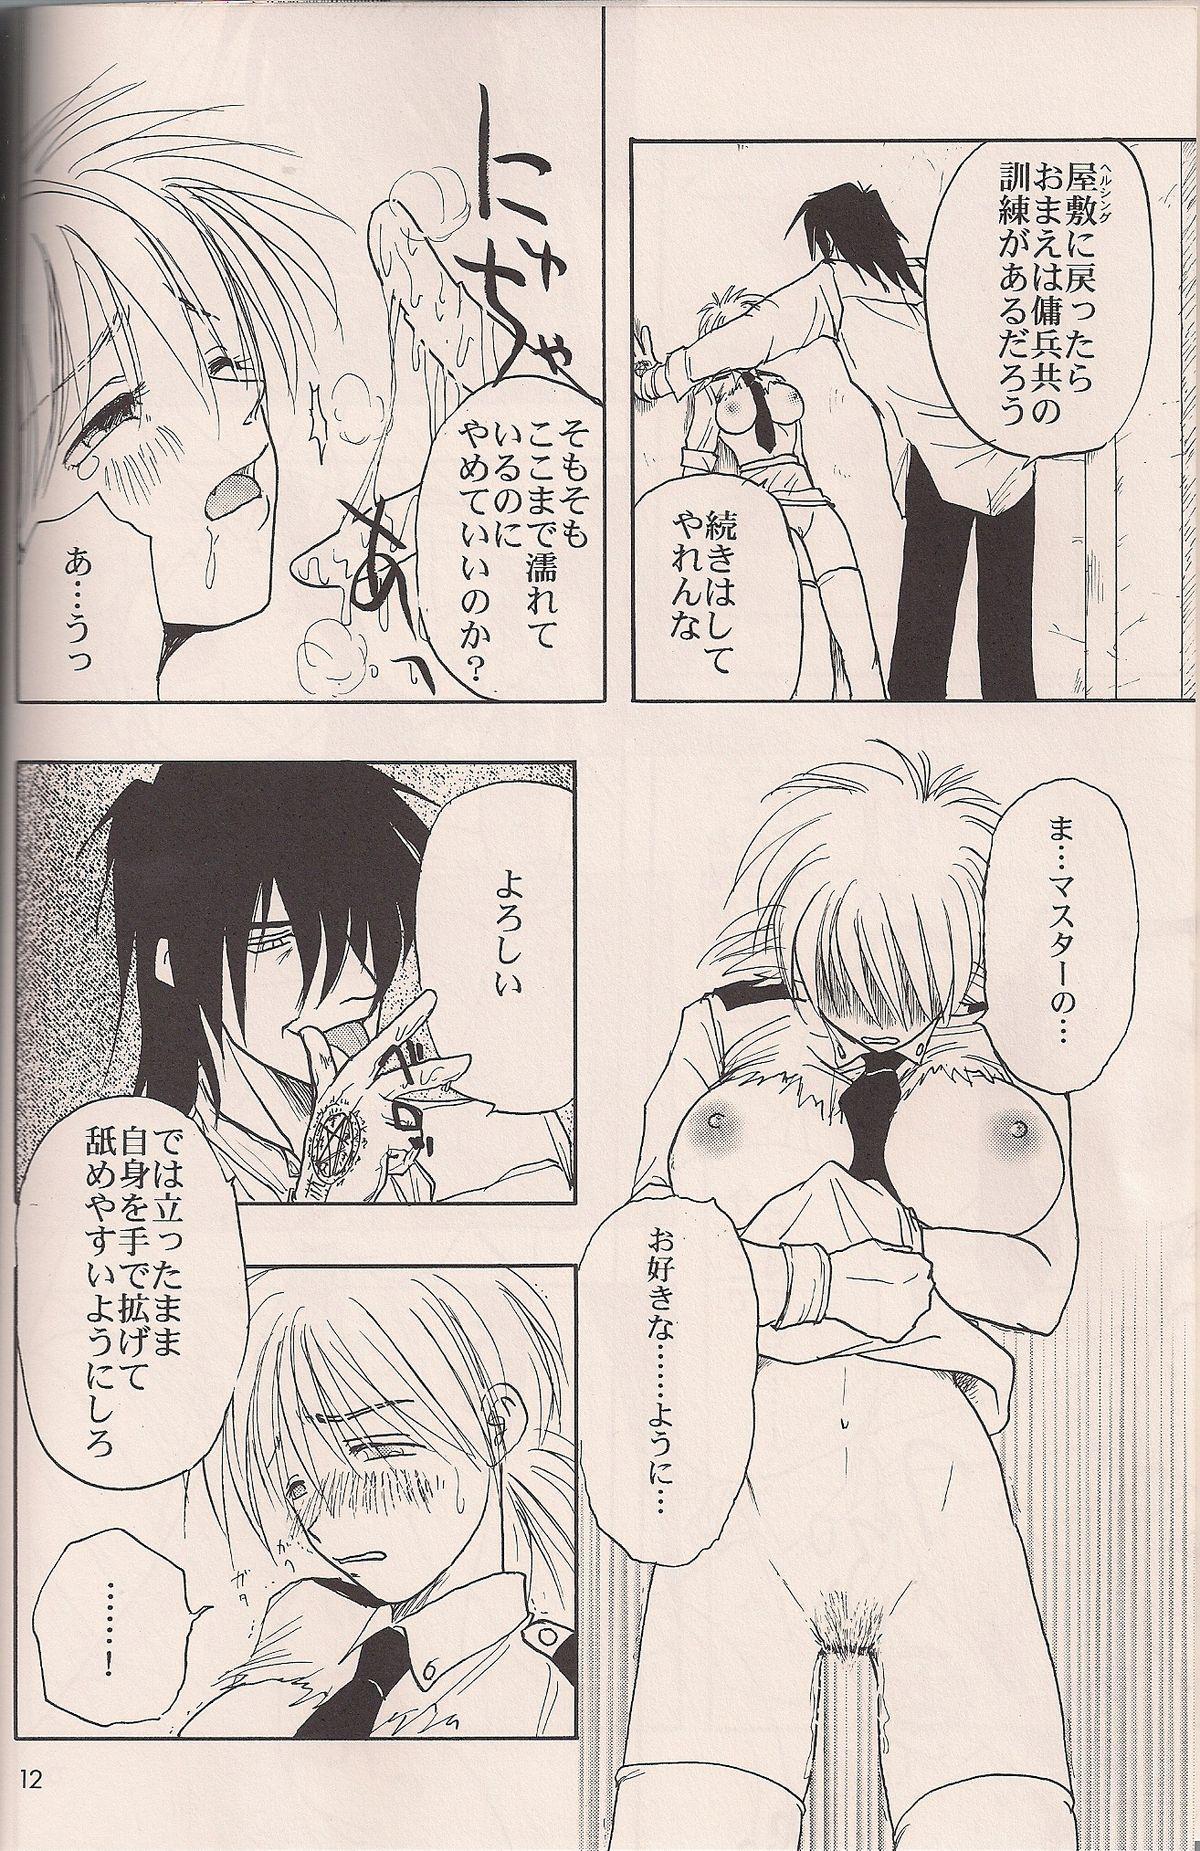 Enzai no Kiroku 10